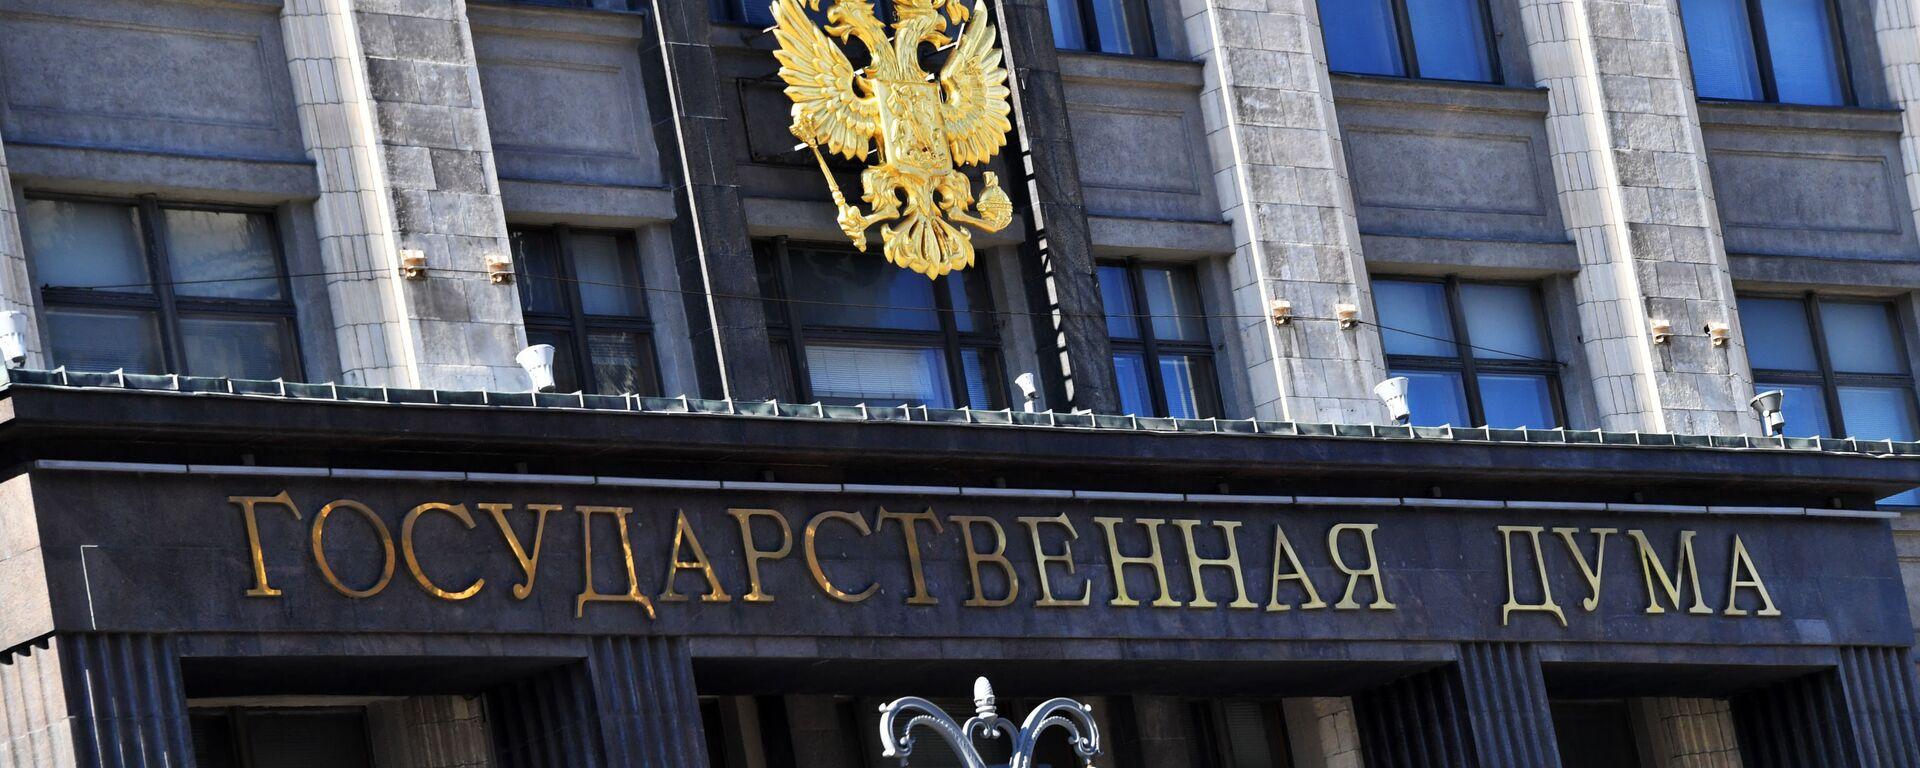 La sede de la Duma Estatal rusa en Moscú - Sputnik Mundo, 1920, 01.06.2021